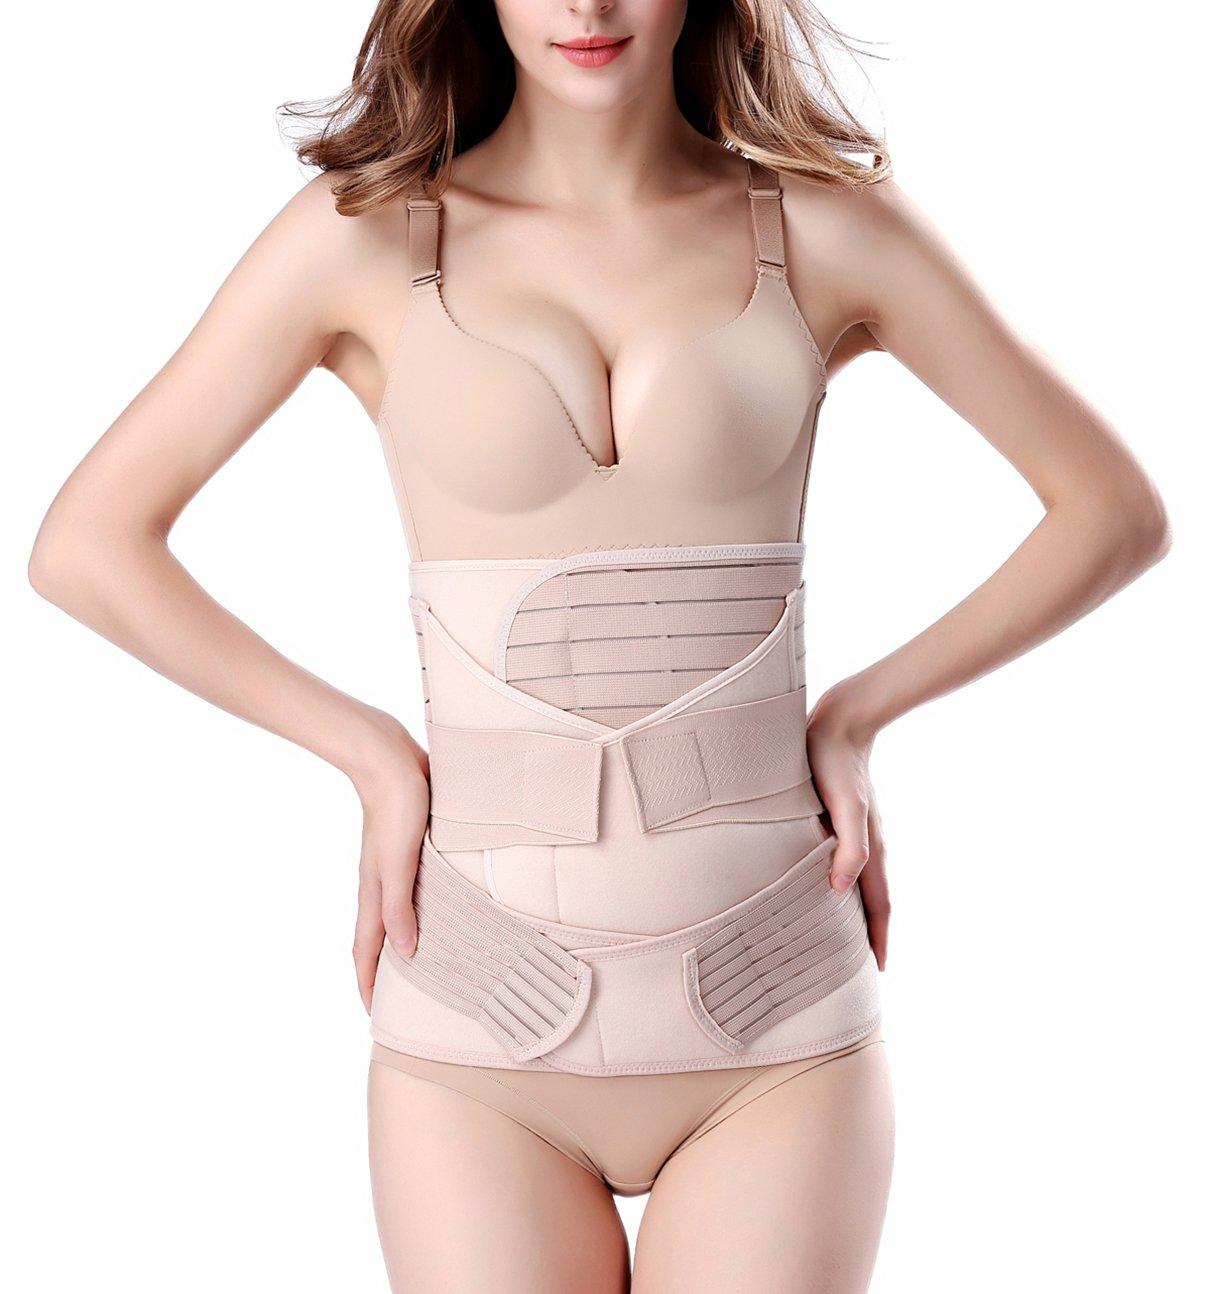 Chongerfei 3 in 1 Postpartum Support Recovery Belly Wrap Waist/Pelvis Belt Body Shaper Postnatal Shapewear (Plus Size for Weight Over 190lbs, Beige)